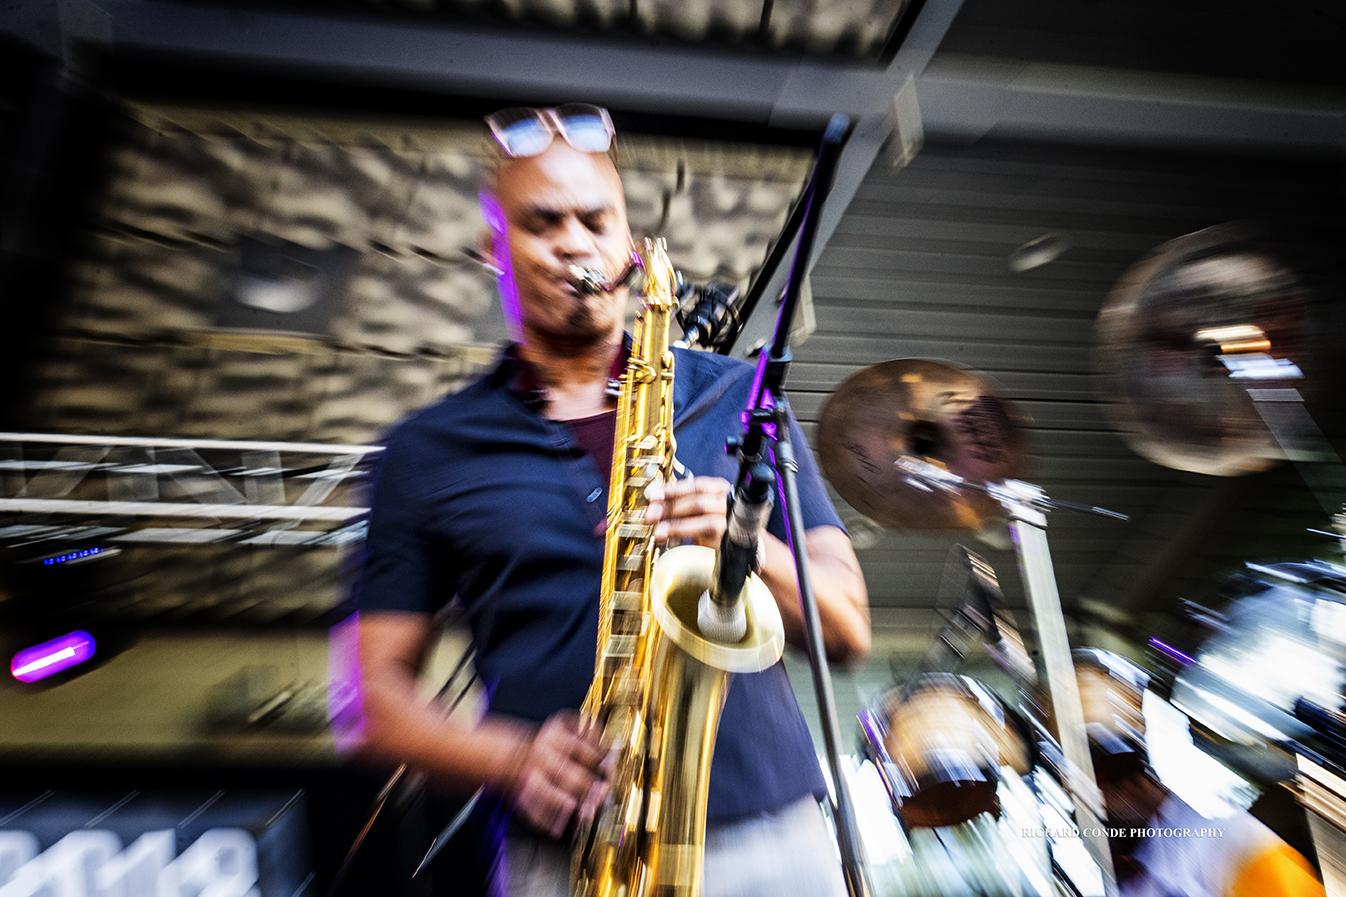 Wayne Escoffery at the 2018 Charlie Parker Jazz Festival